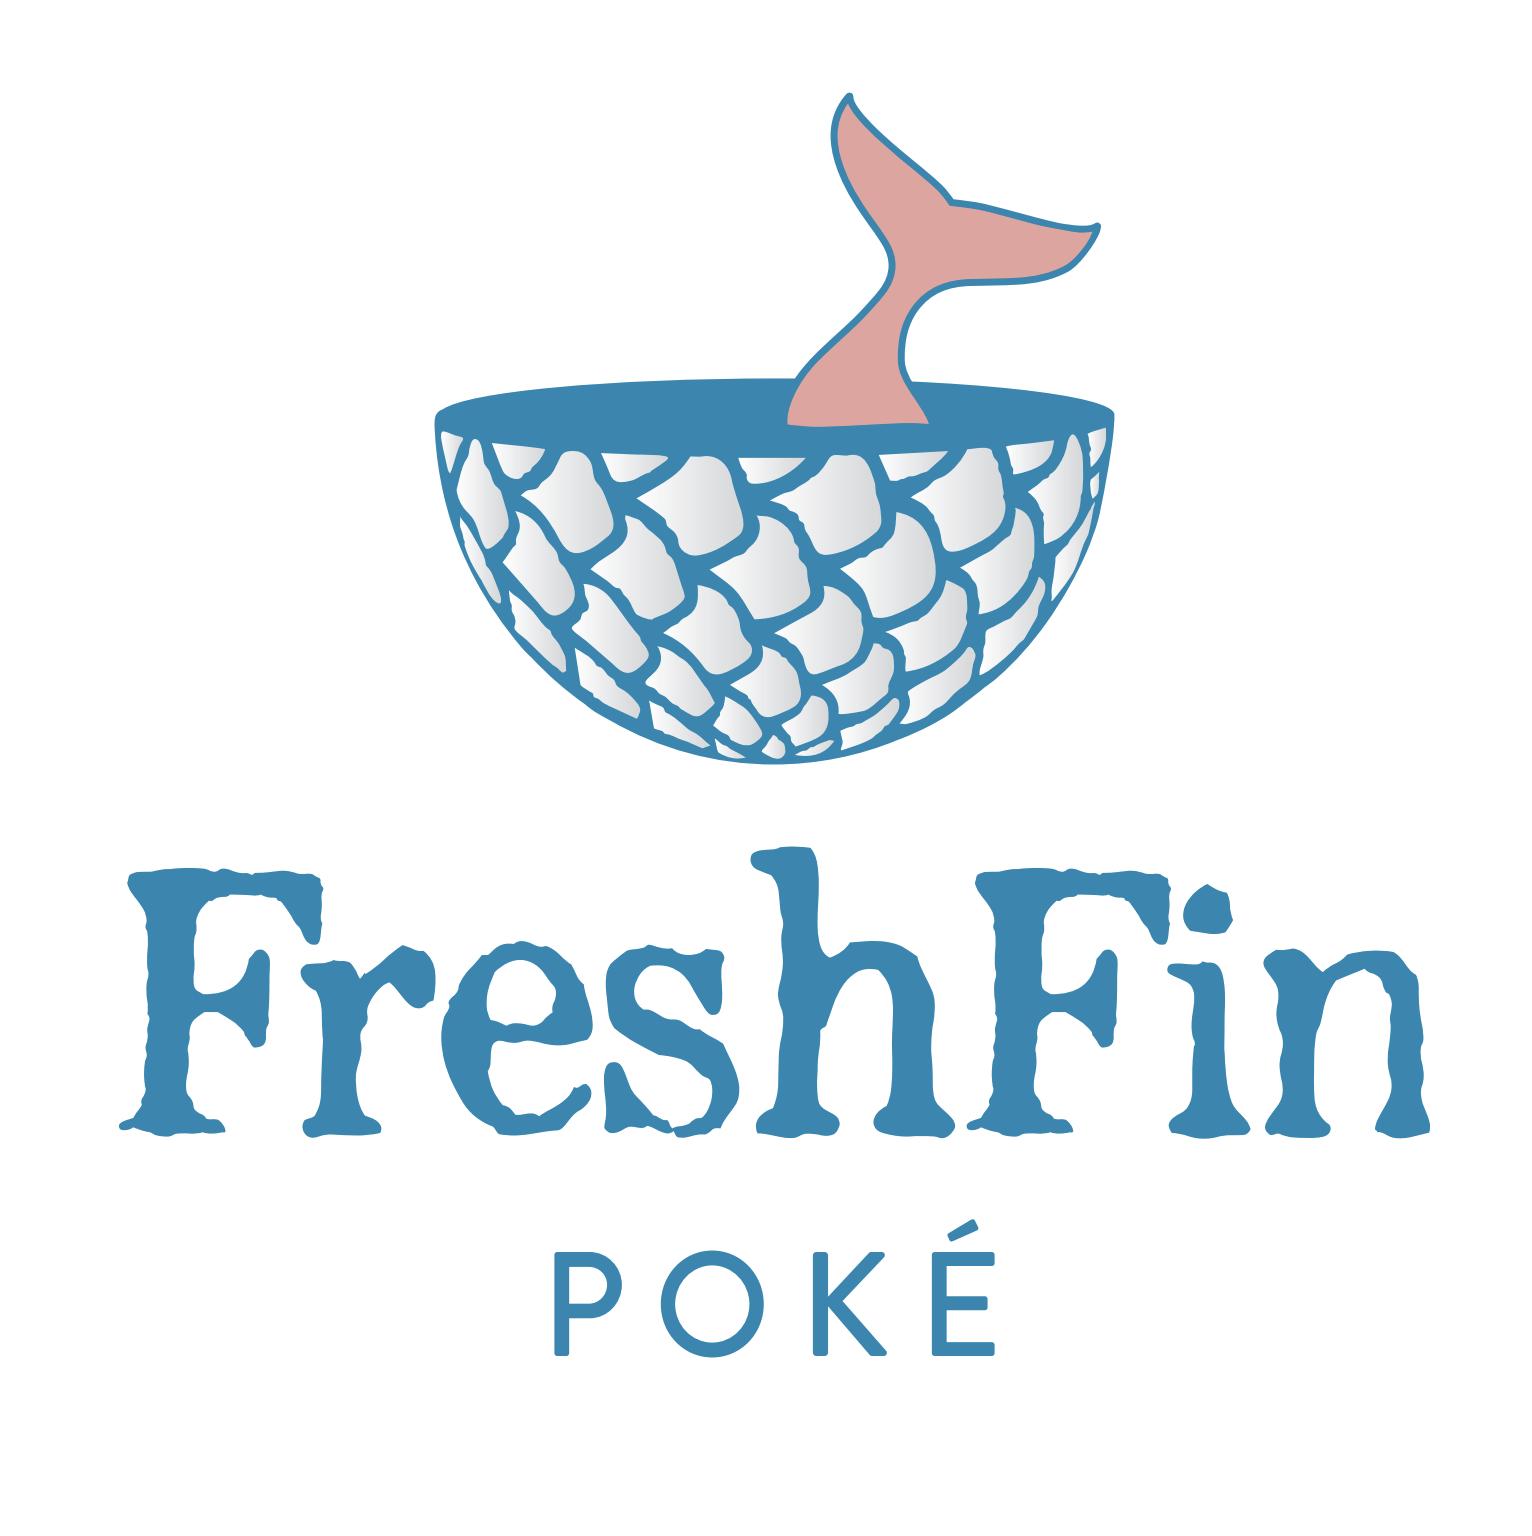 FreshFin Poké Coupon